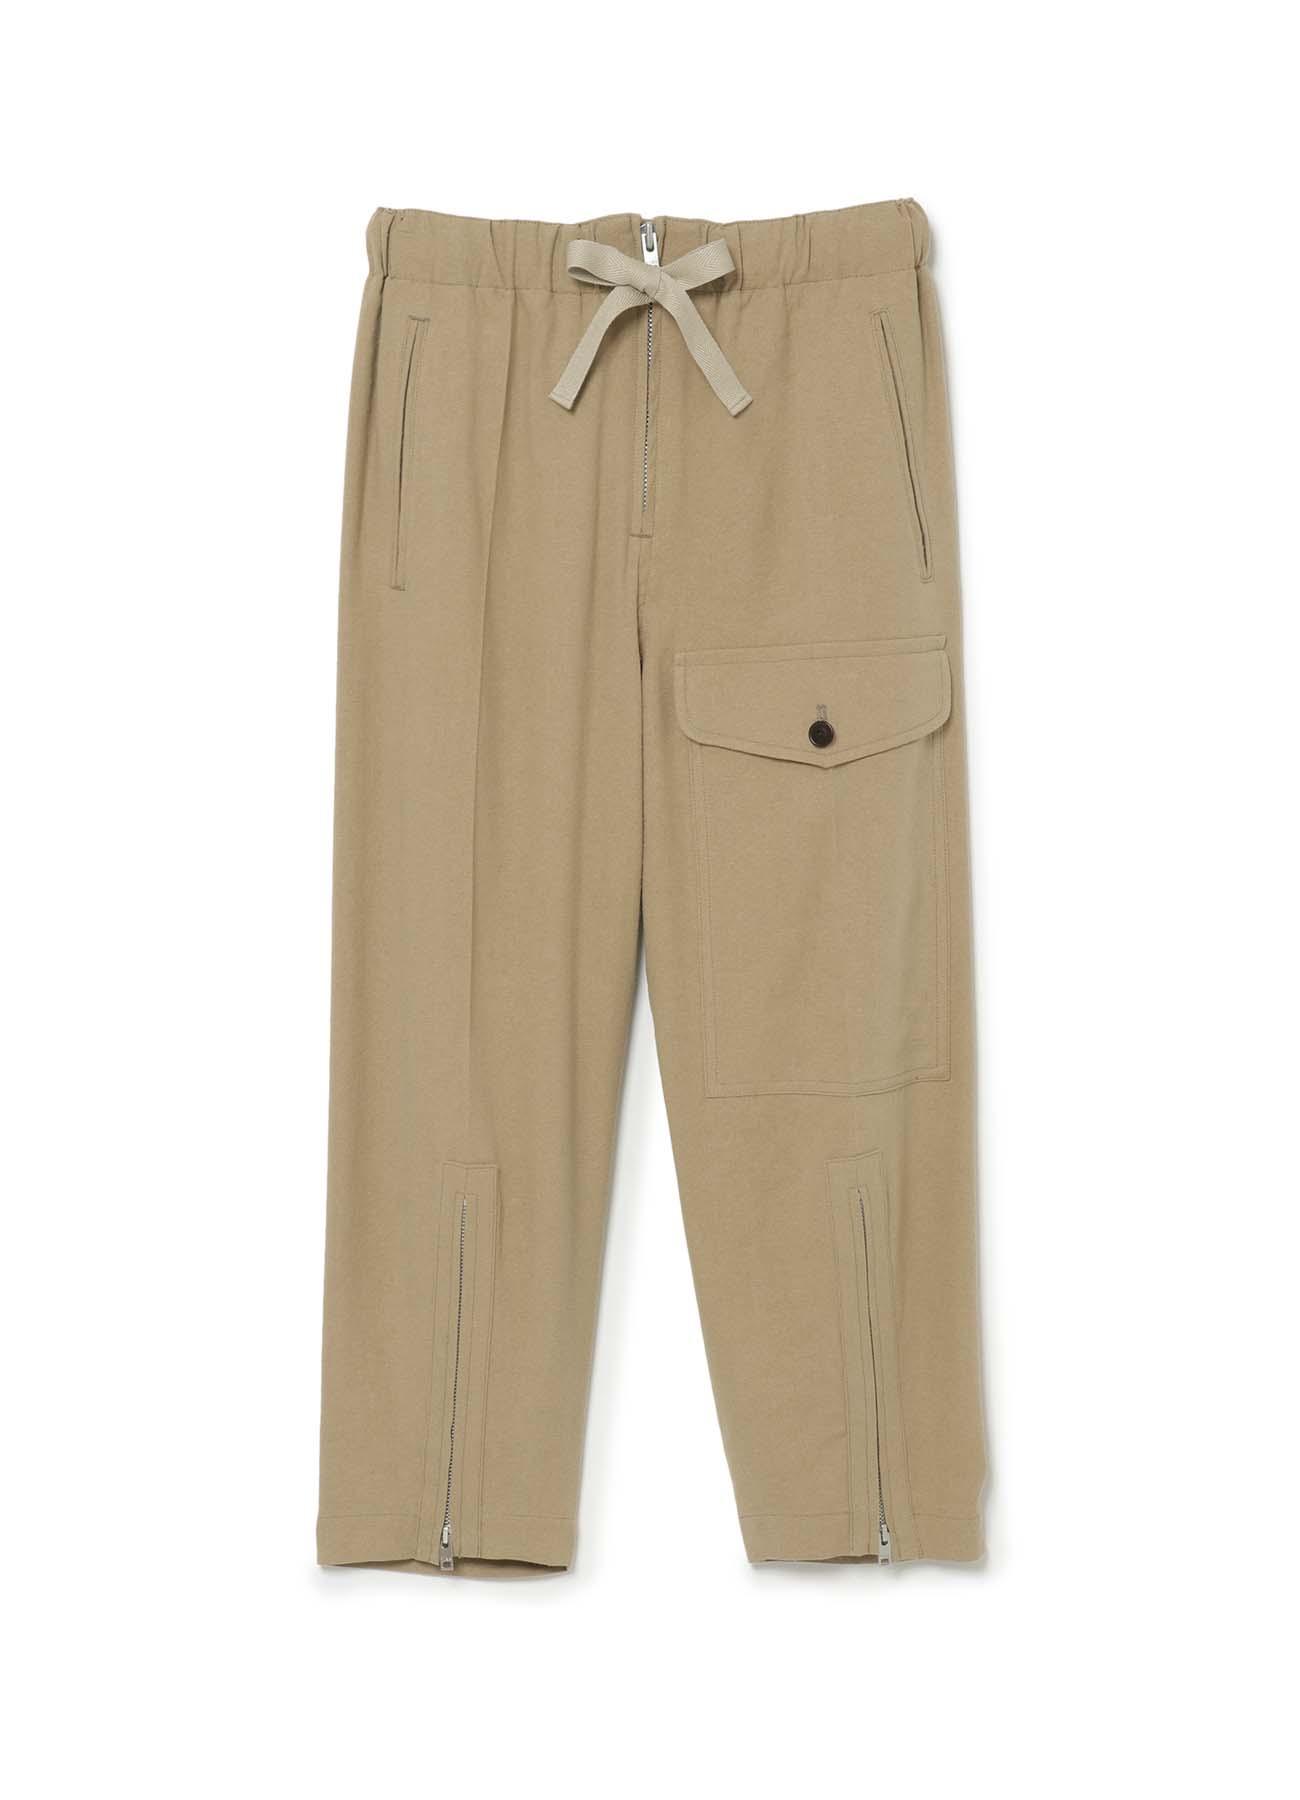 Shabby chic silk Linen Cloth ポケットパンツ